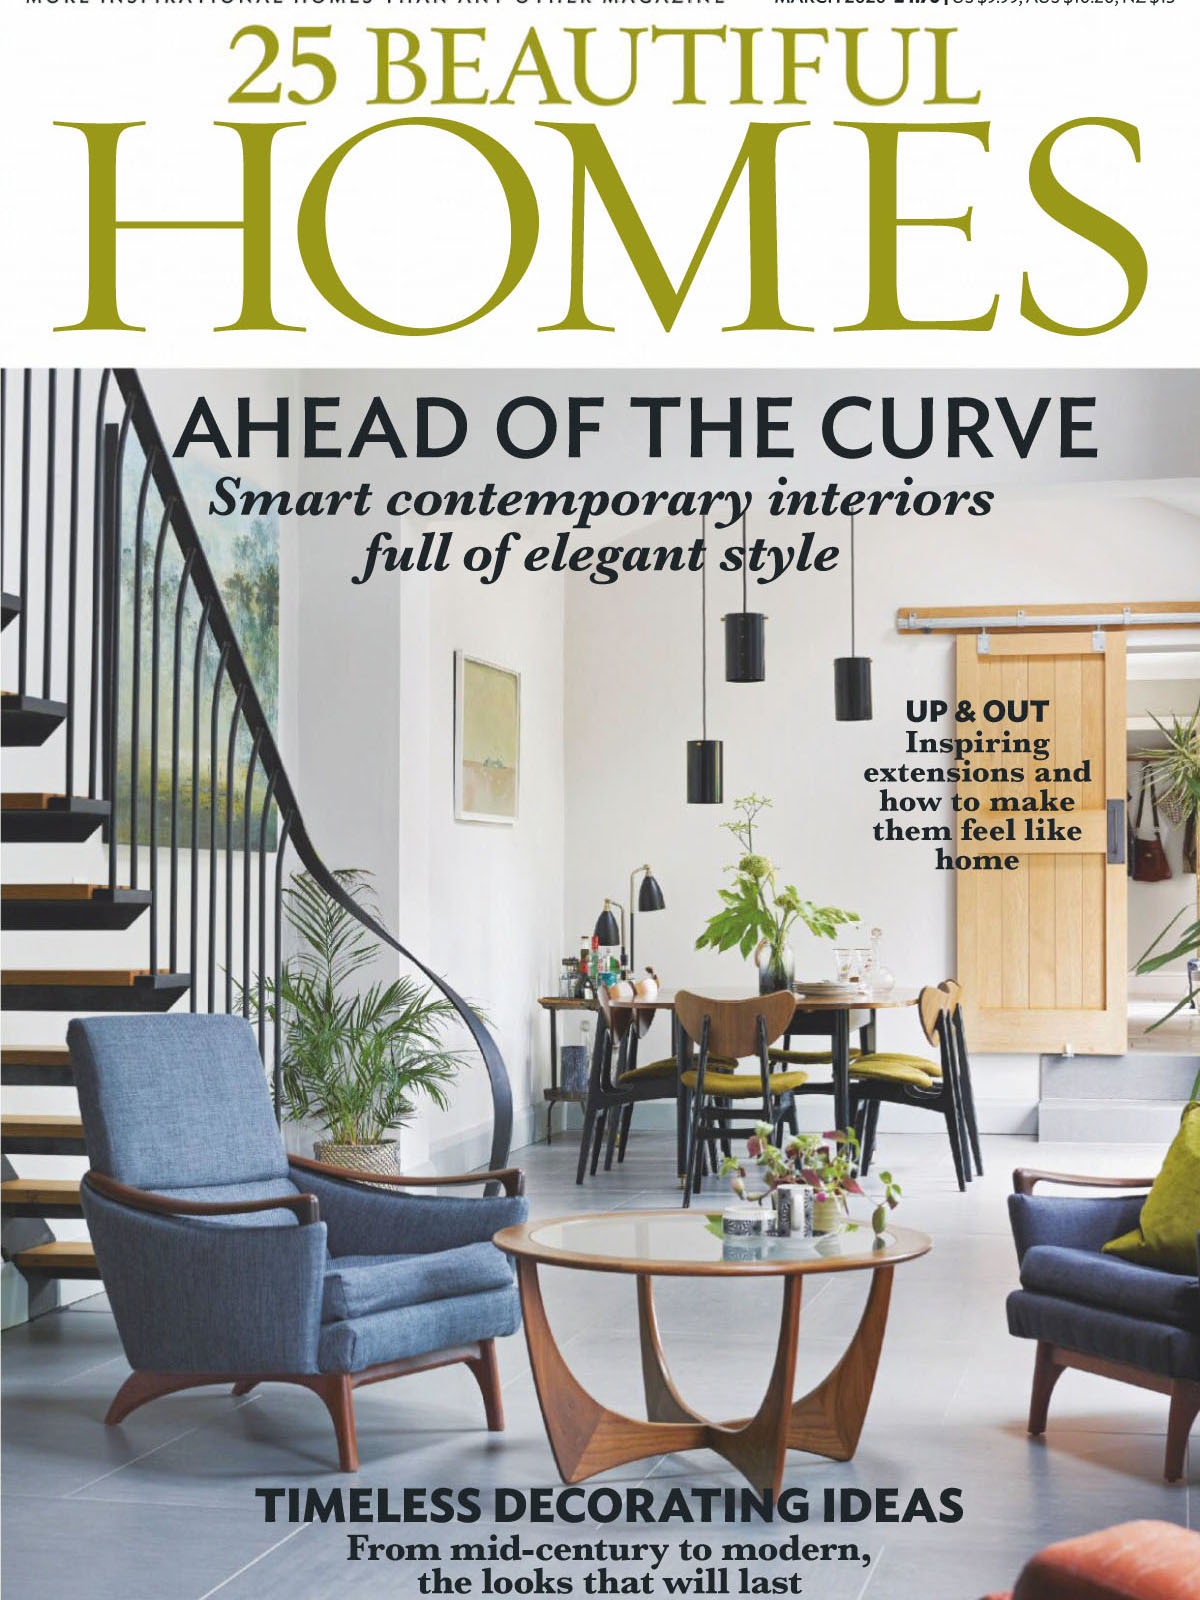 《25 Beautiful Homes》英国版时尚家居设计杂志2020年03月号